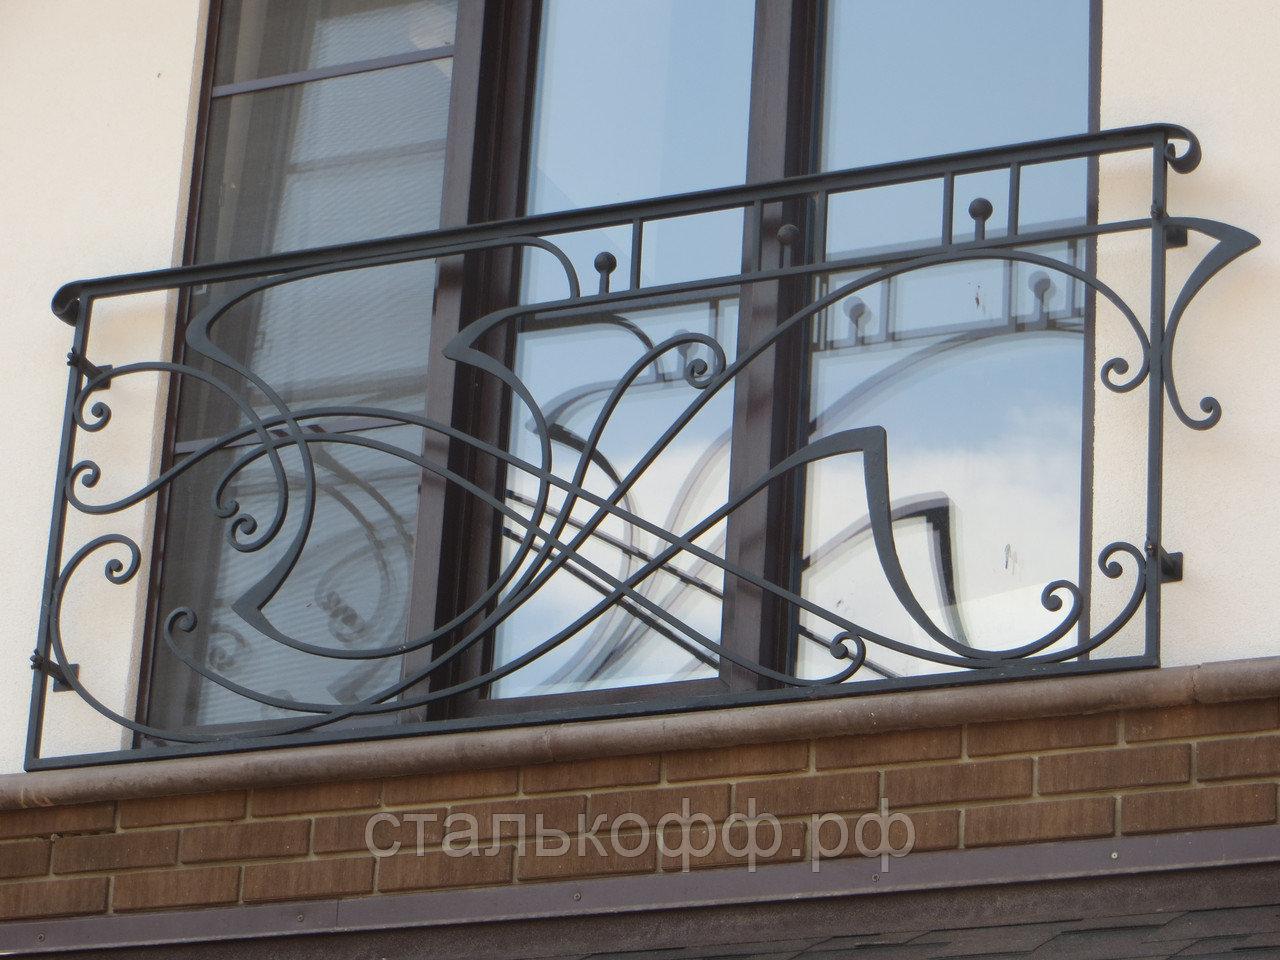 Французский балкон, его плюсы и минусы | плюсы и минусы